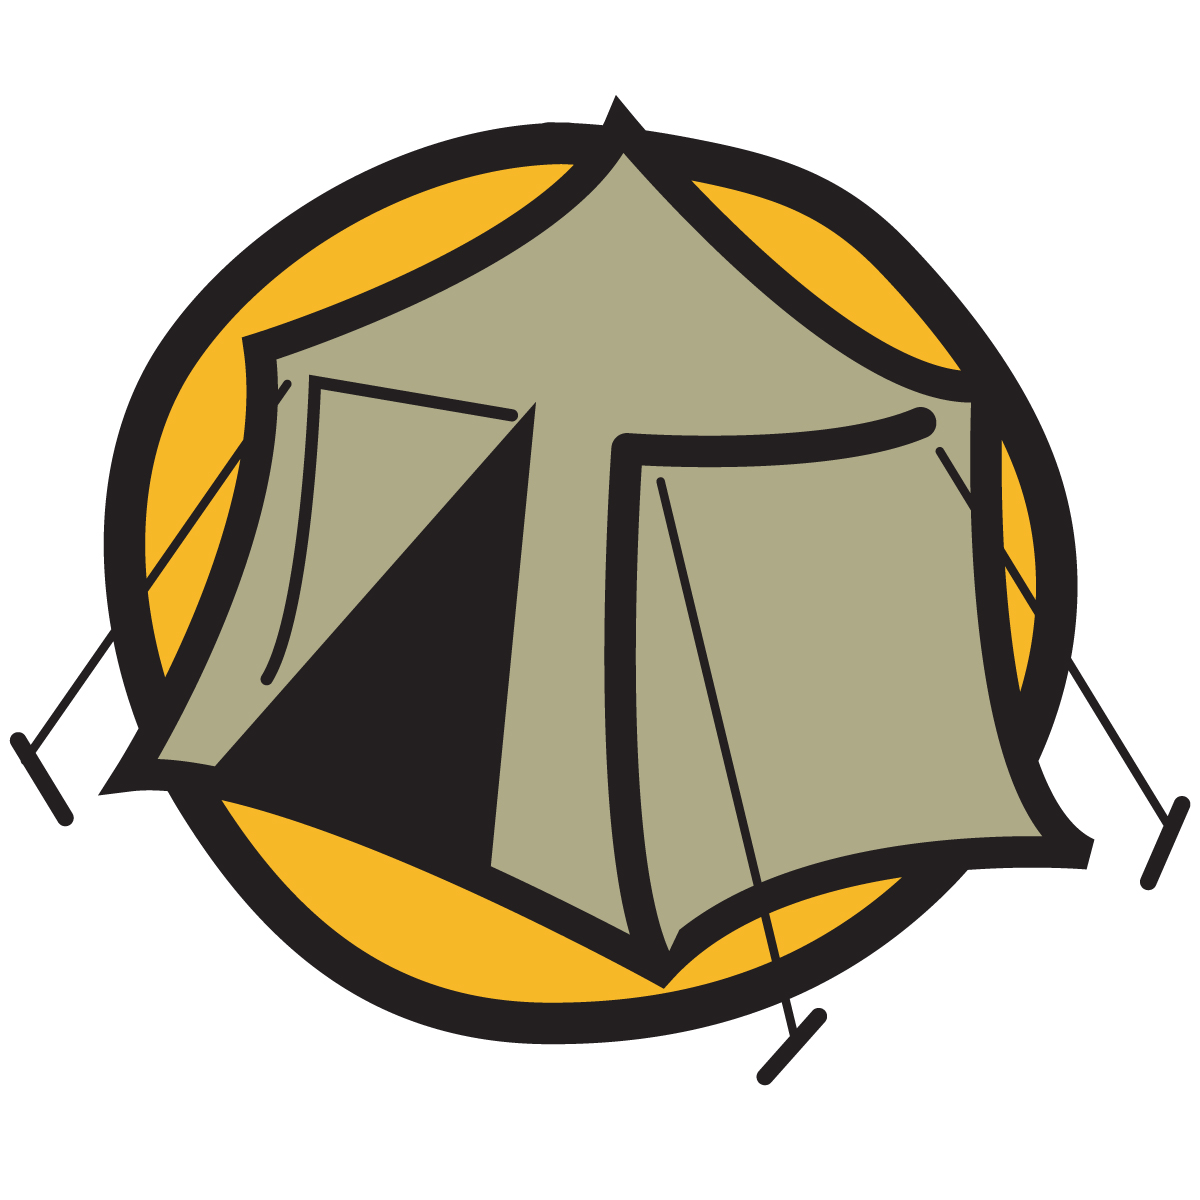 1200x1200 Camp Fire Clipart Camping Trip